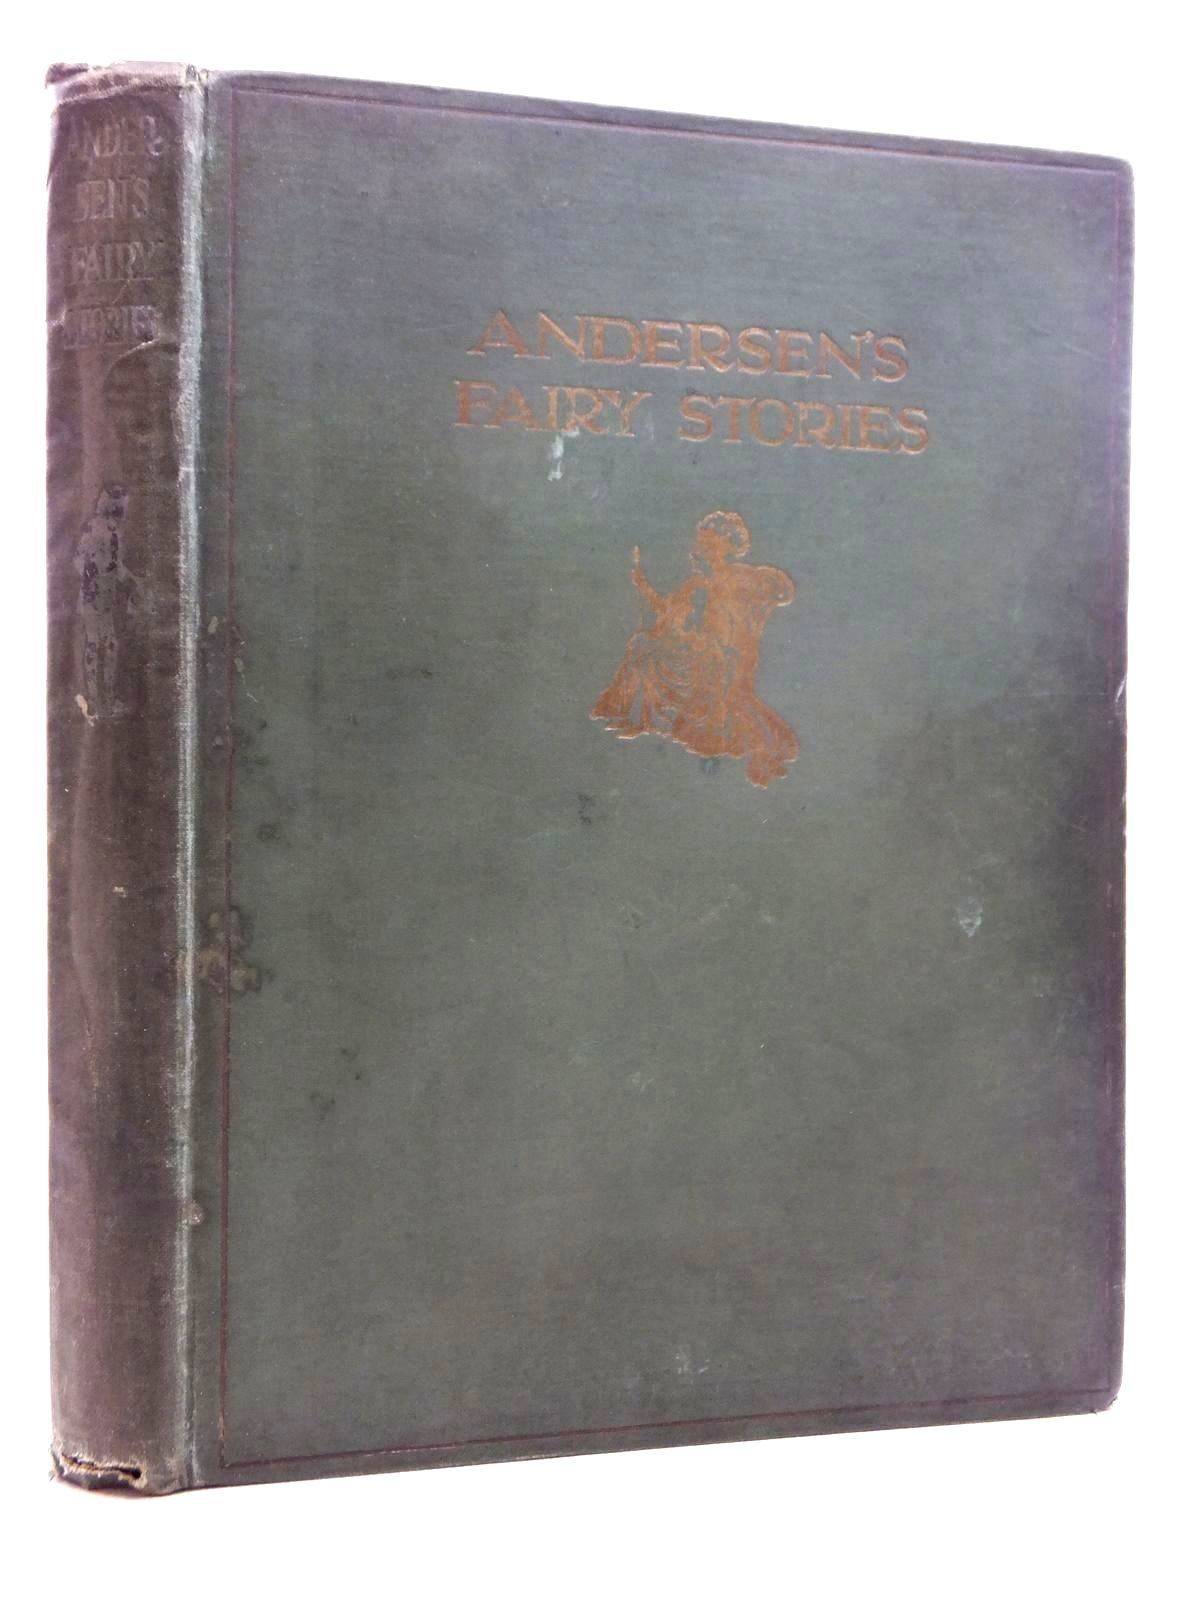 Cover of HANS ANDERSEN'S FAIRY STORIES by Hans Christian Andersen